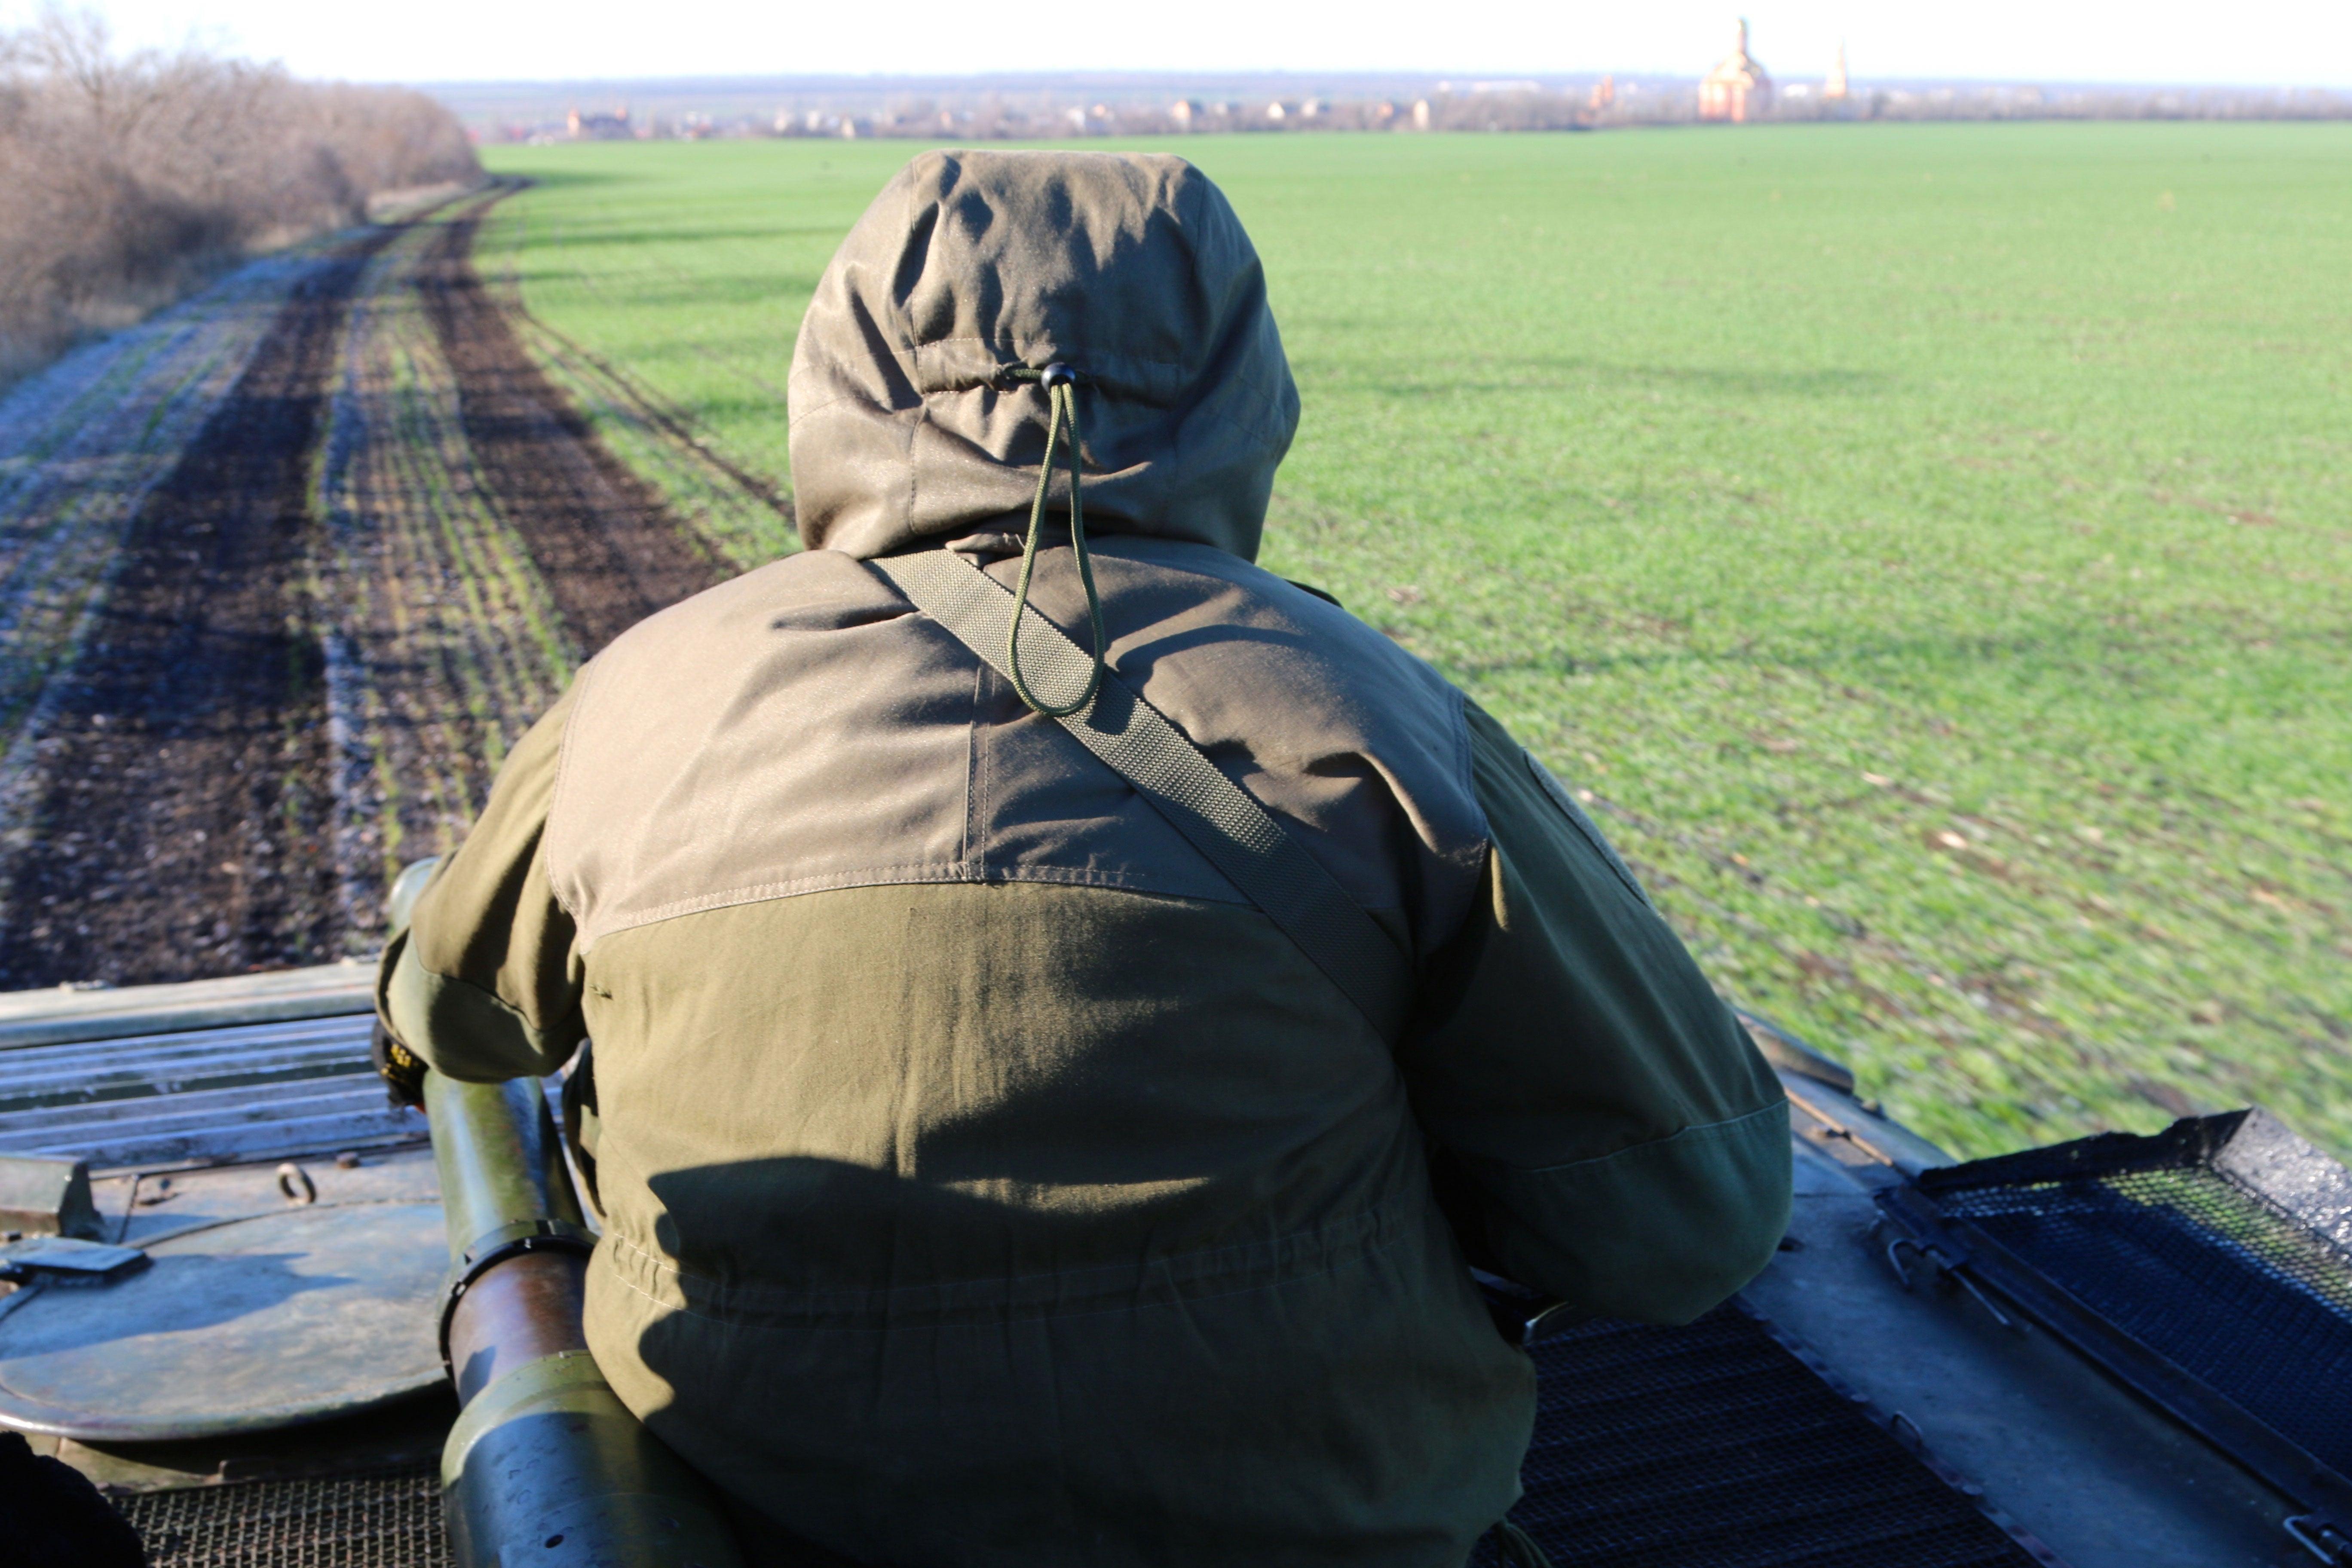 Ukrainian soldiers on patrol in Marinka.